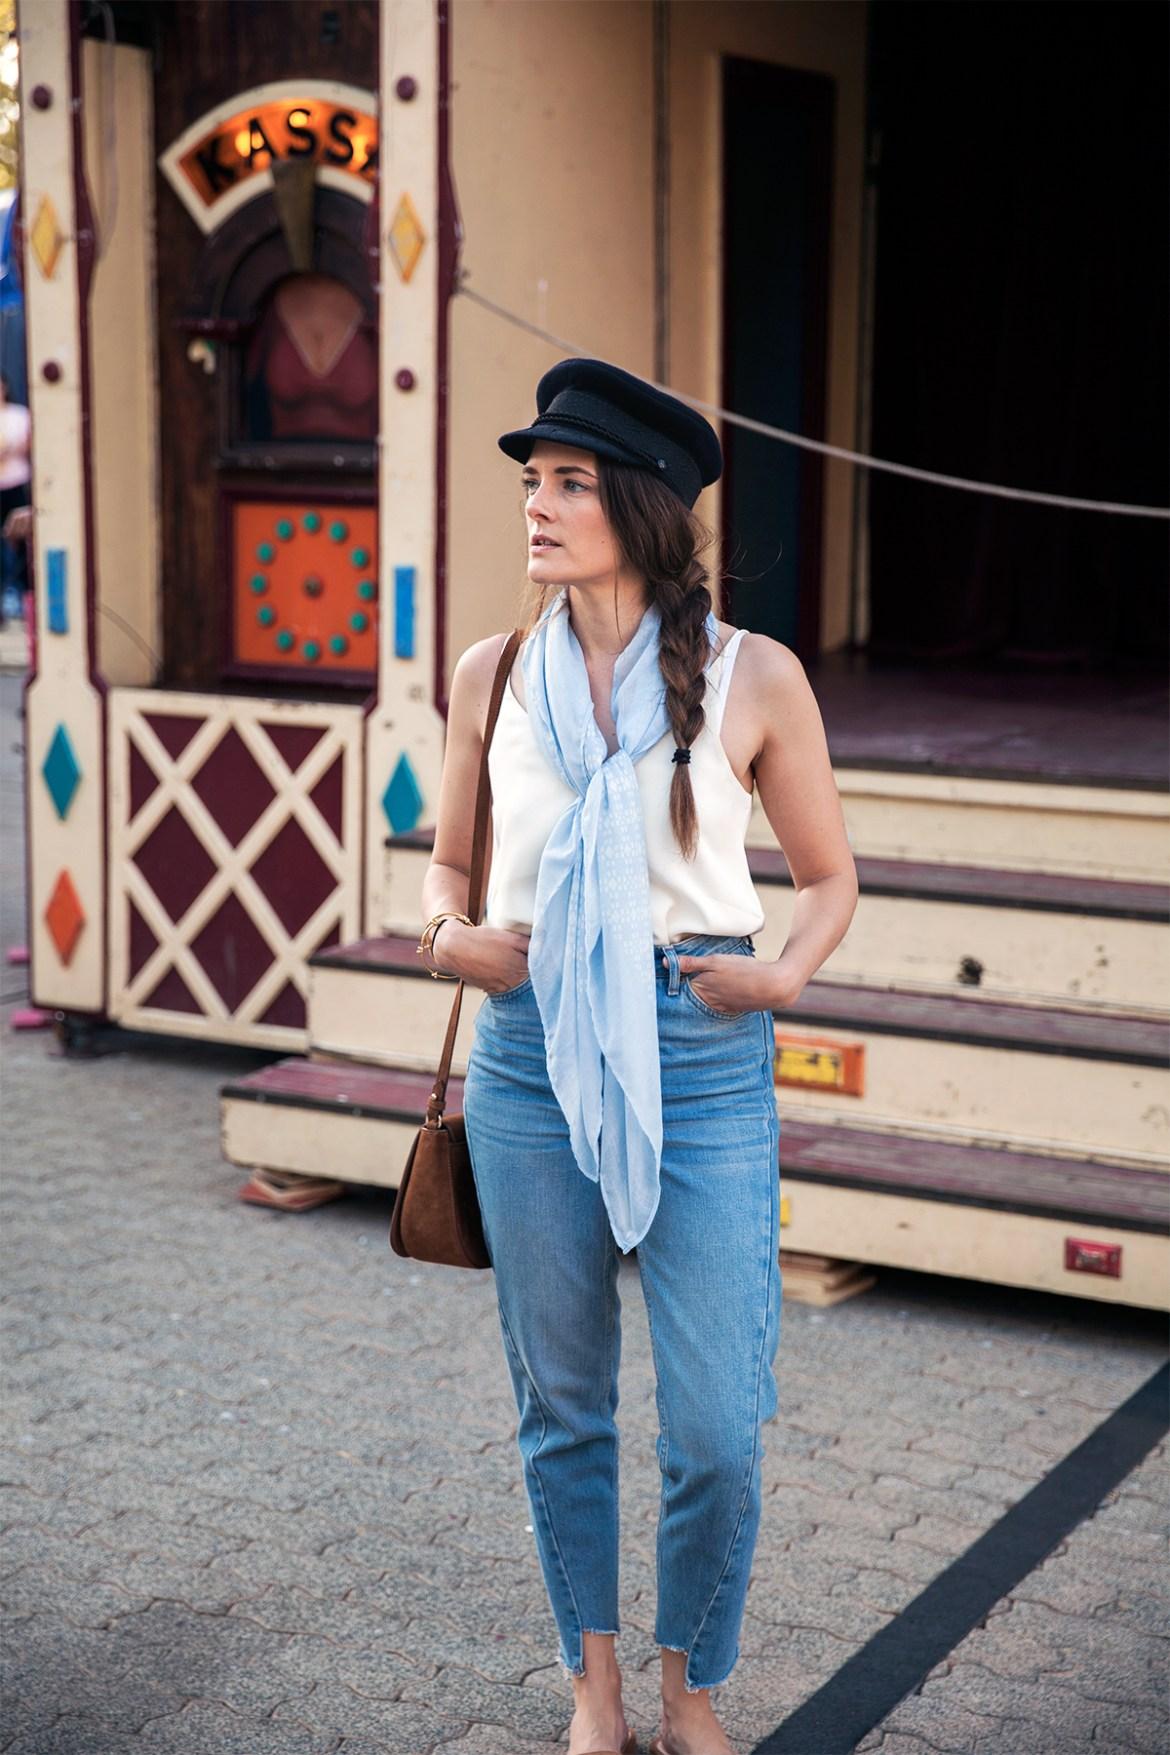 Inspiring Wit, Perth blogger exploring Northbridge for the Fringe World festival 2017. Street style fashion.